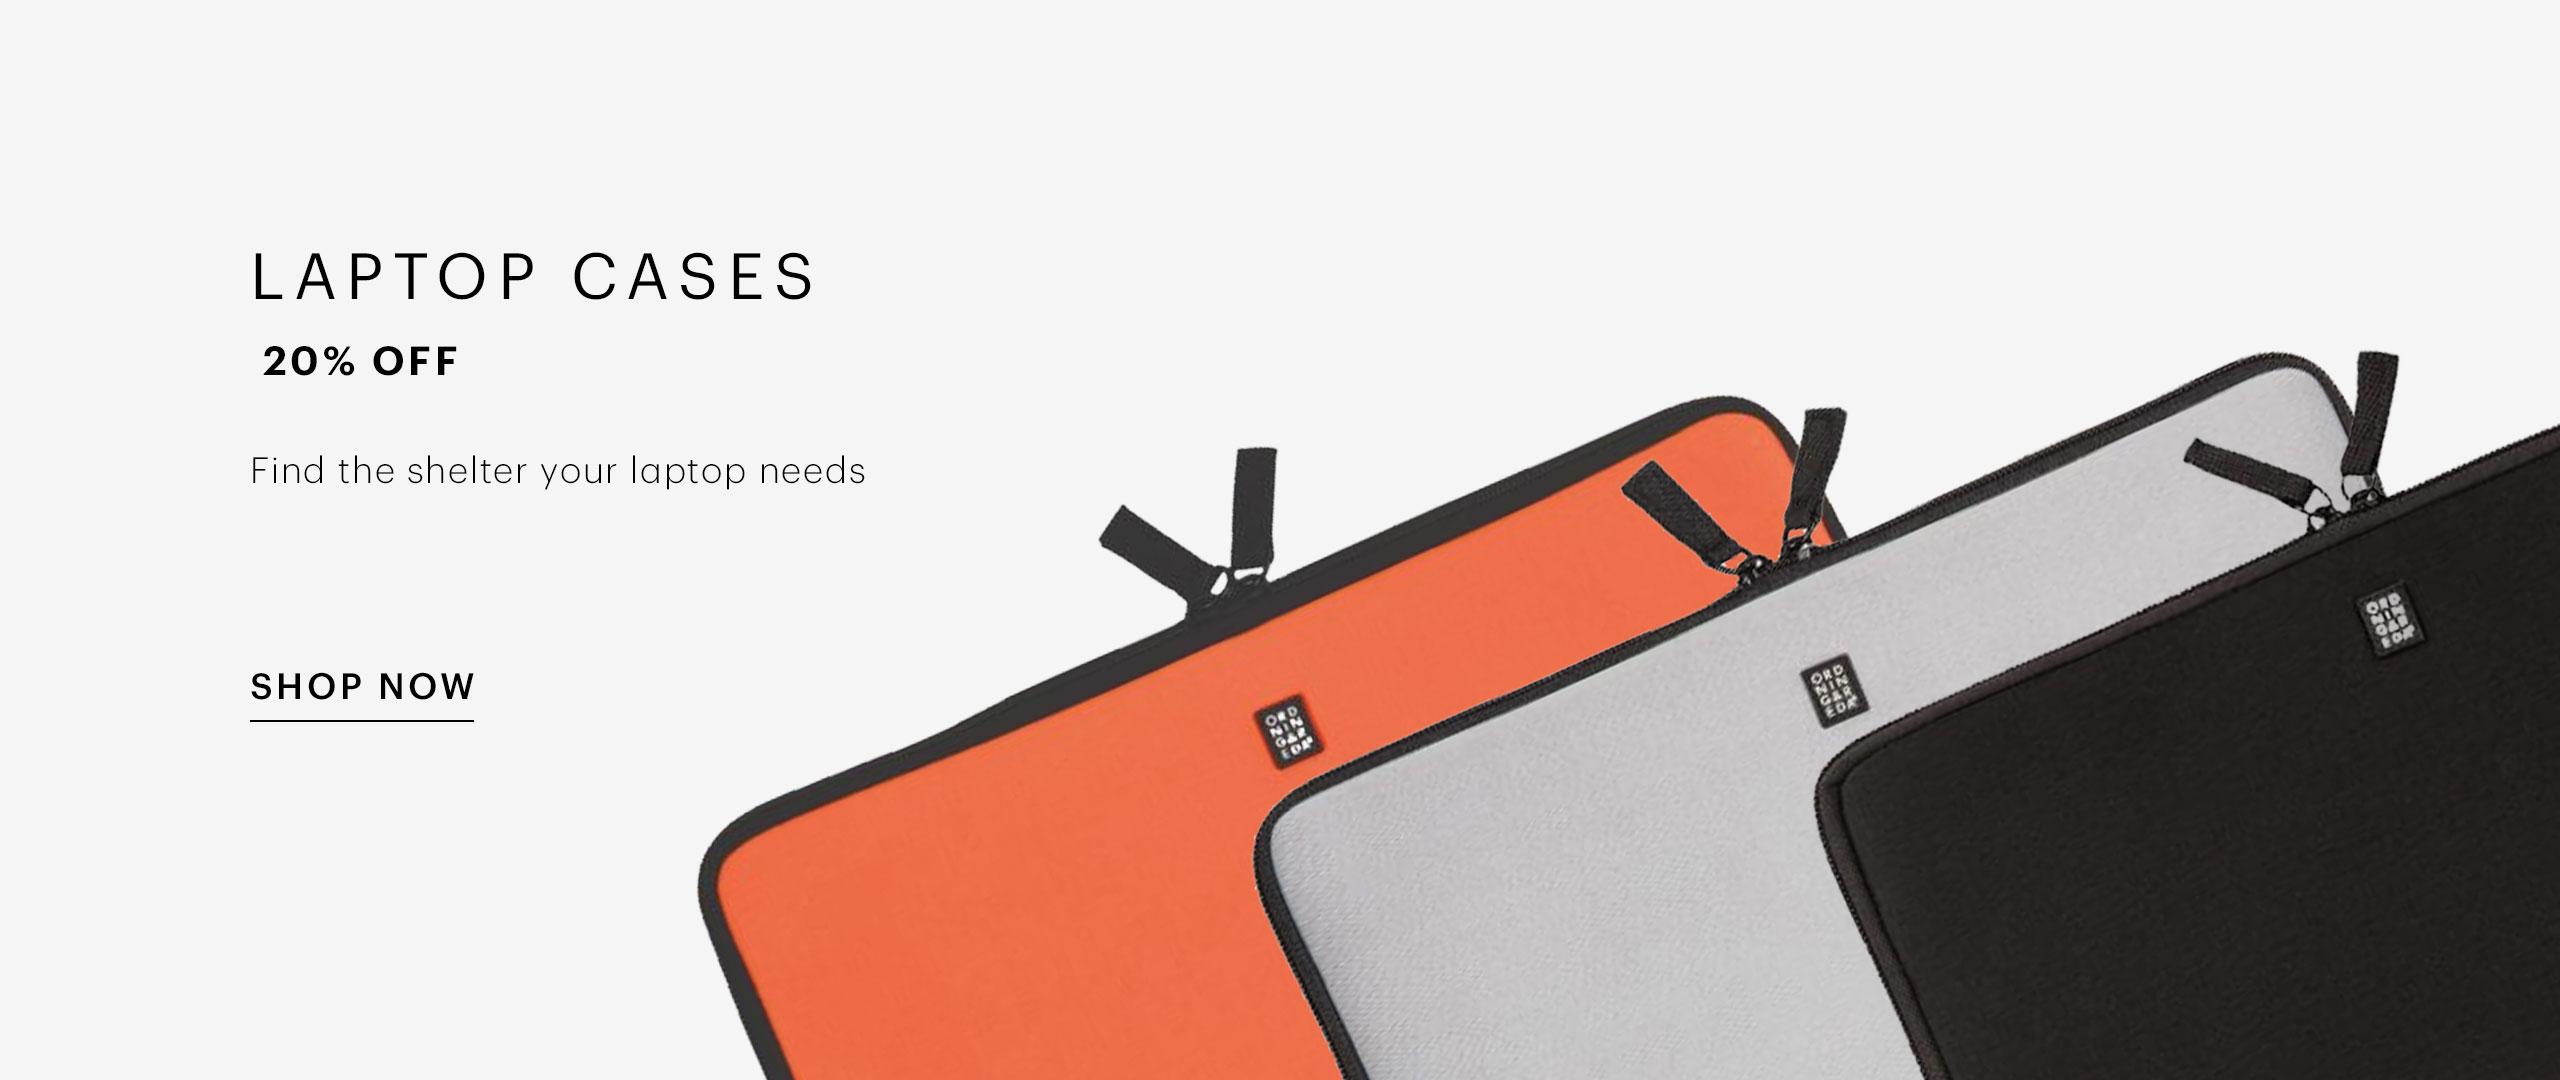 [OR] BEU EN - Laptop Cases